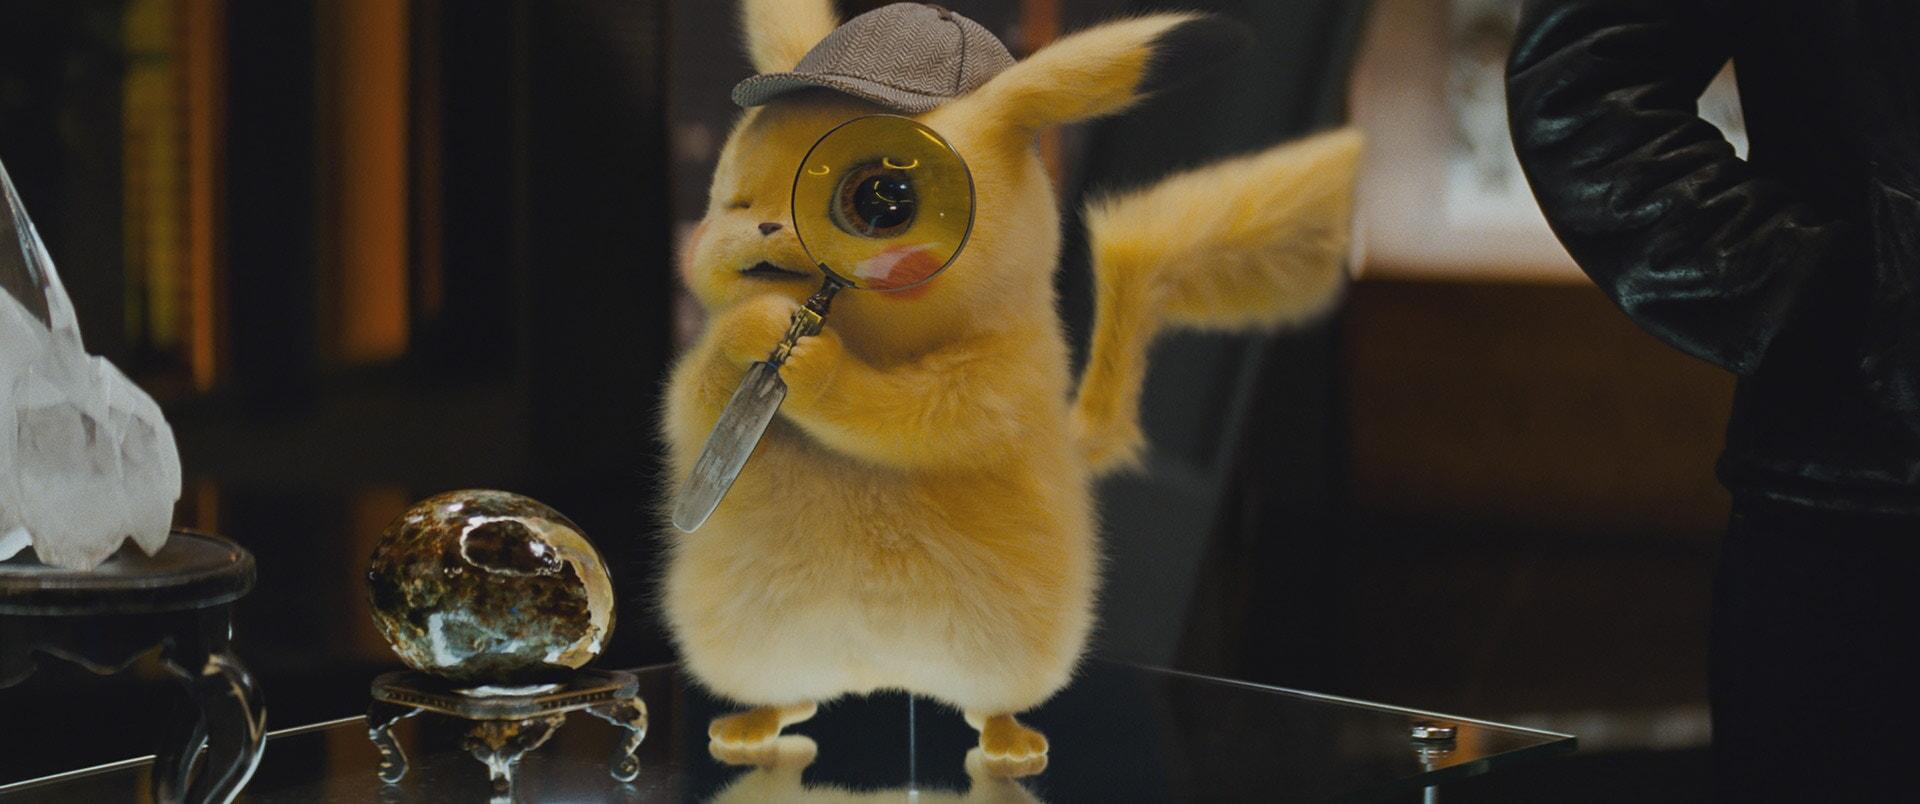 Detective Pikachu (RYAN REYNOLDS)